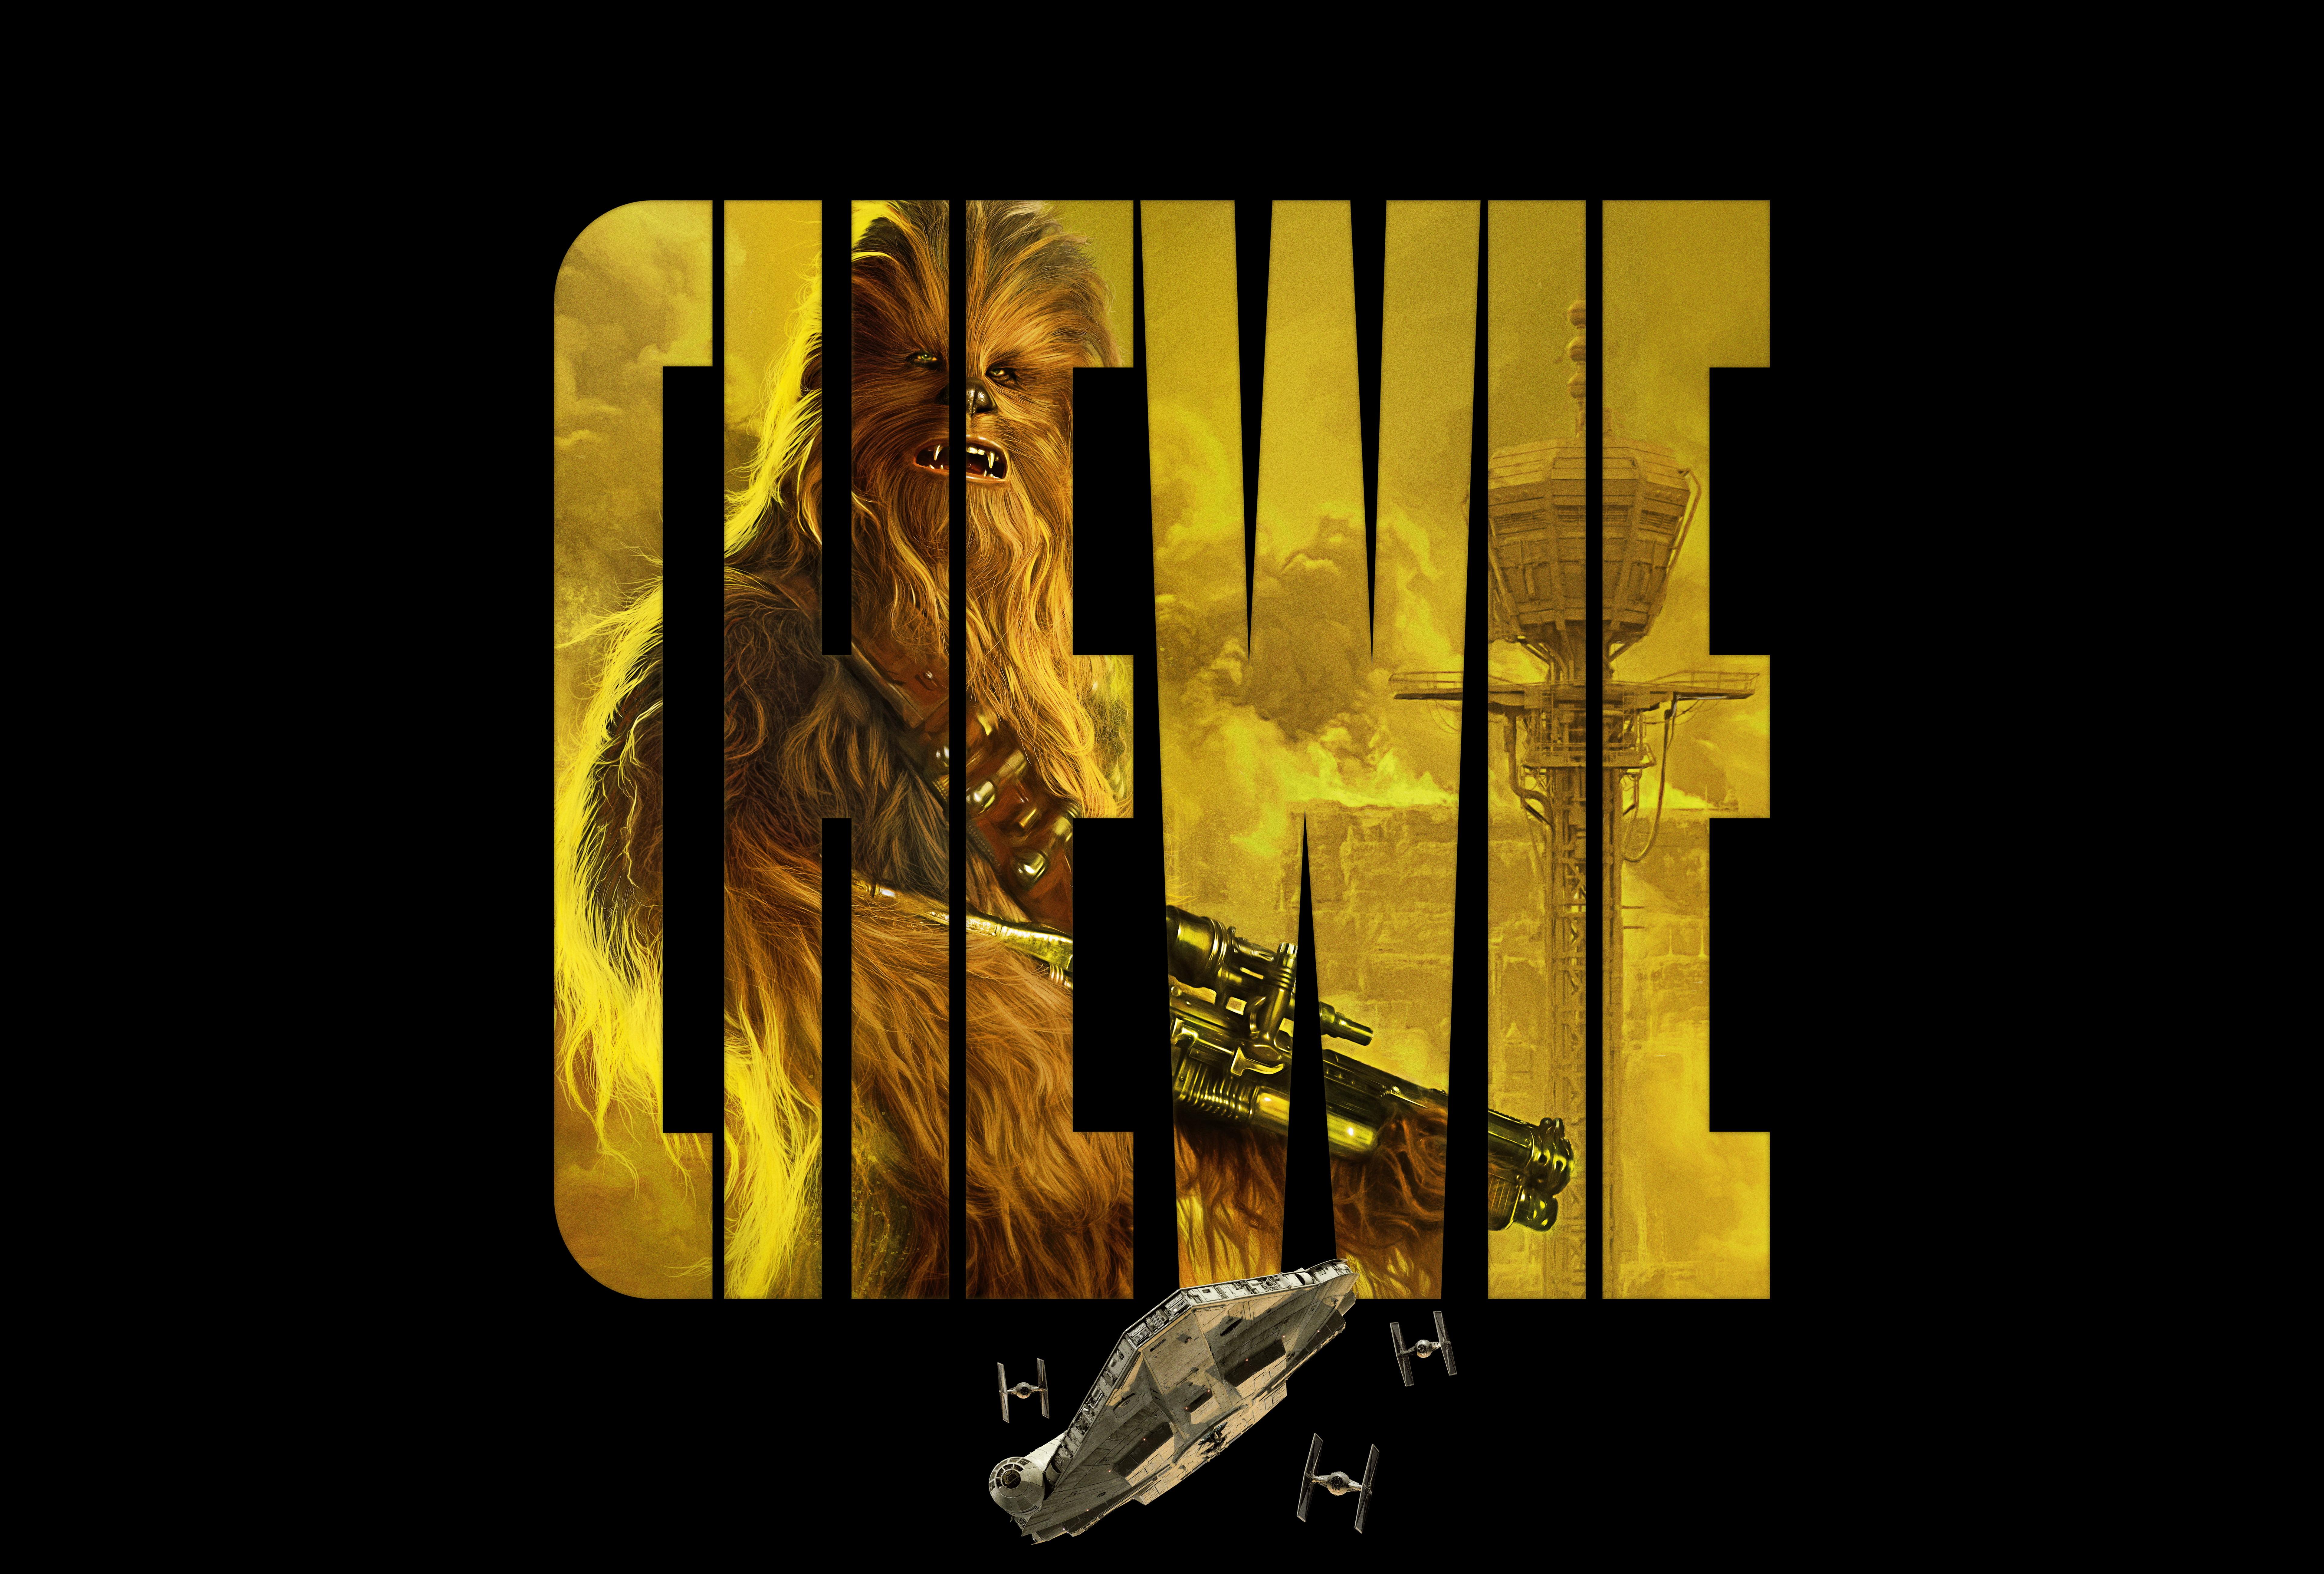 Star Wars Wallpaper Chewbacca 7680x5200 Wallpaper Teahub Io